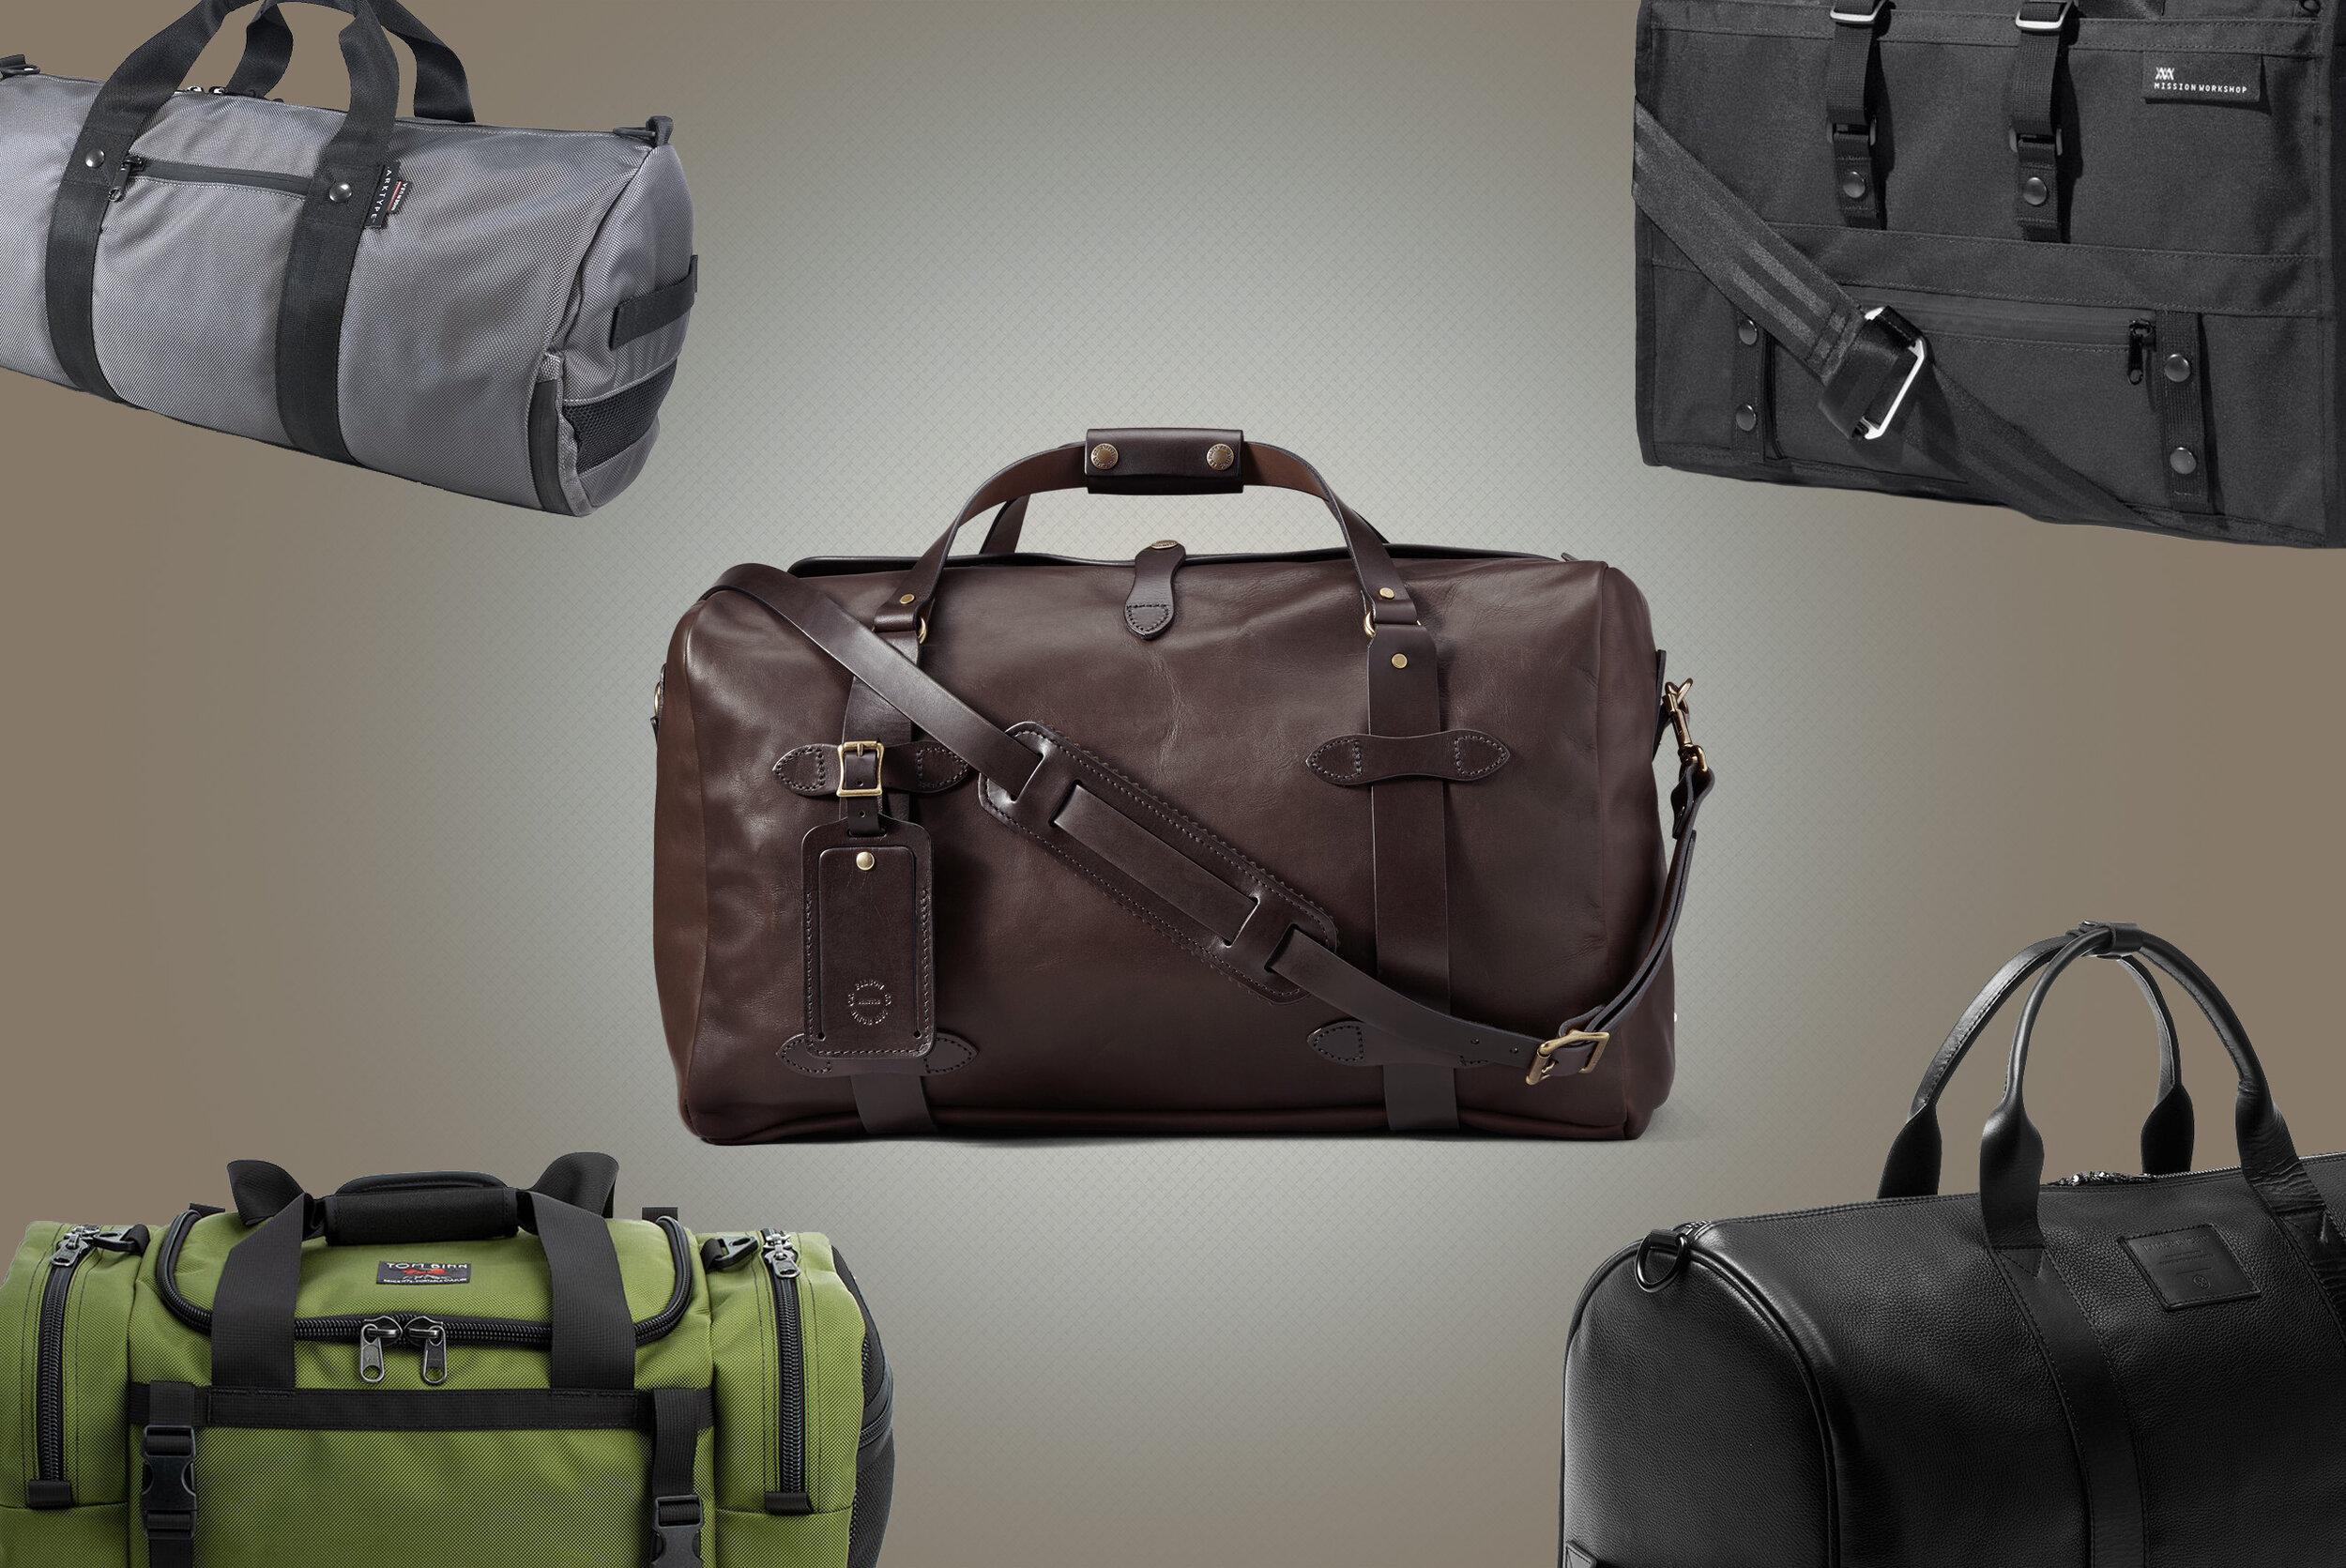 USA SMALL DUFFEL Bag GYM Workout or USA Overnight Duffel Bags